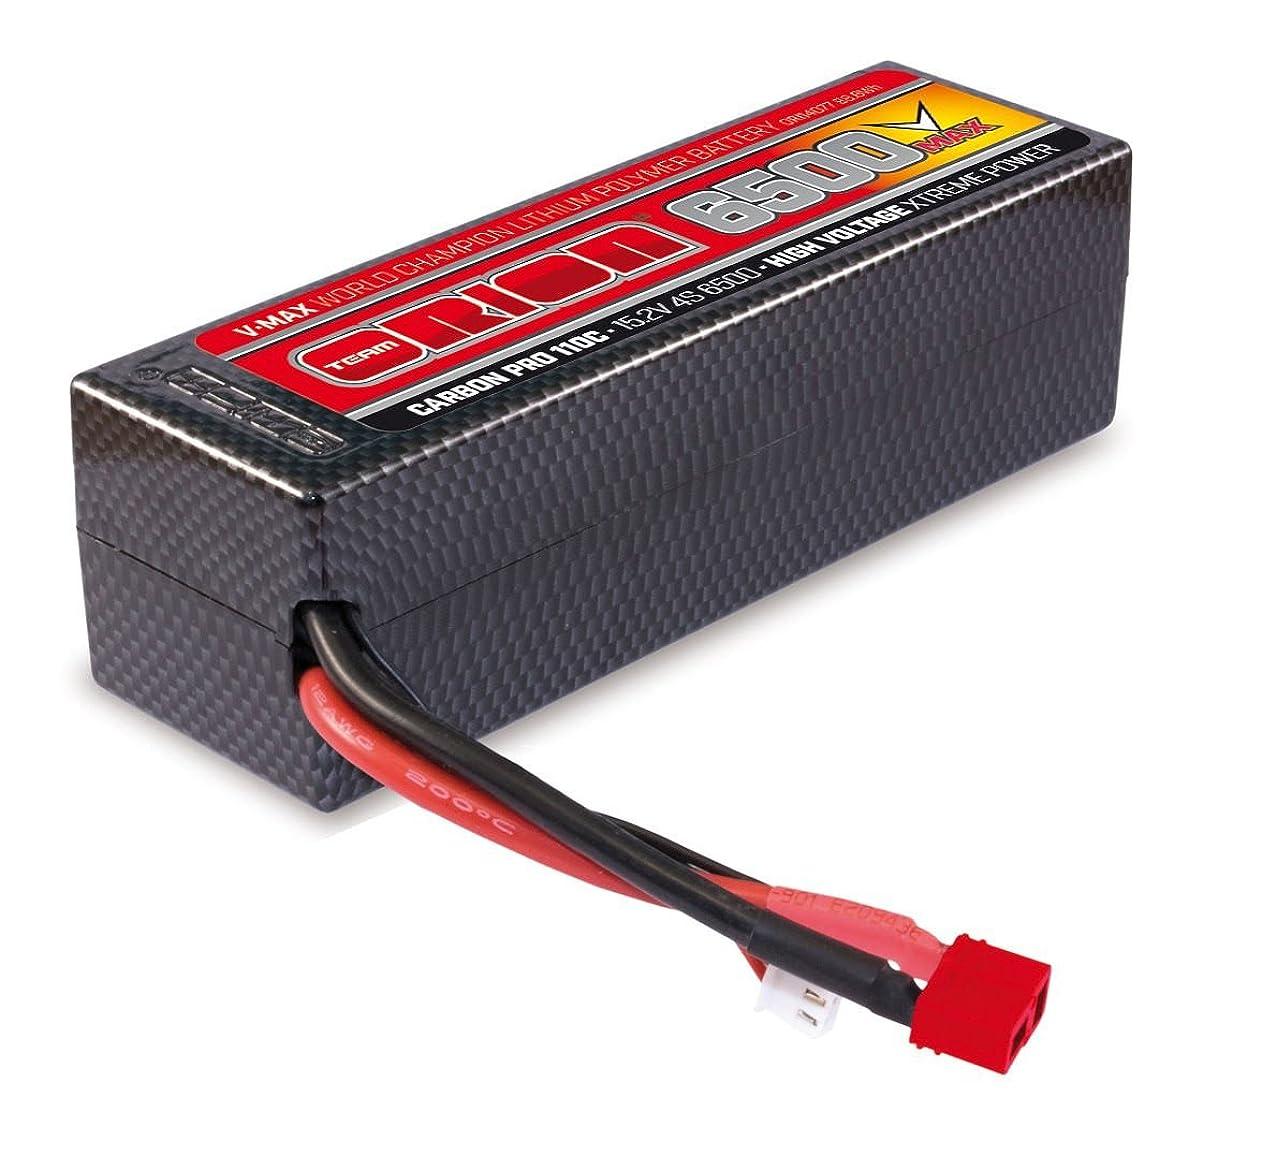 Team Orion Carbon V-Max 15.2V 6500 4S 110C Deans Battery abmcipysoxj74511